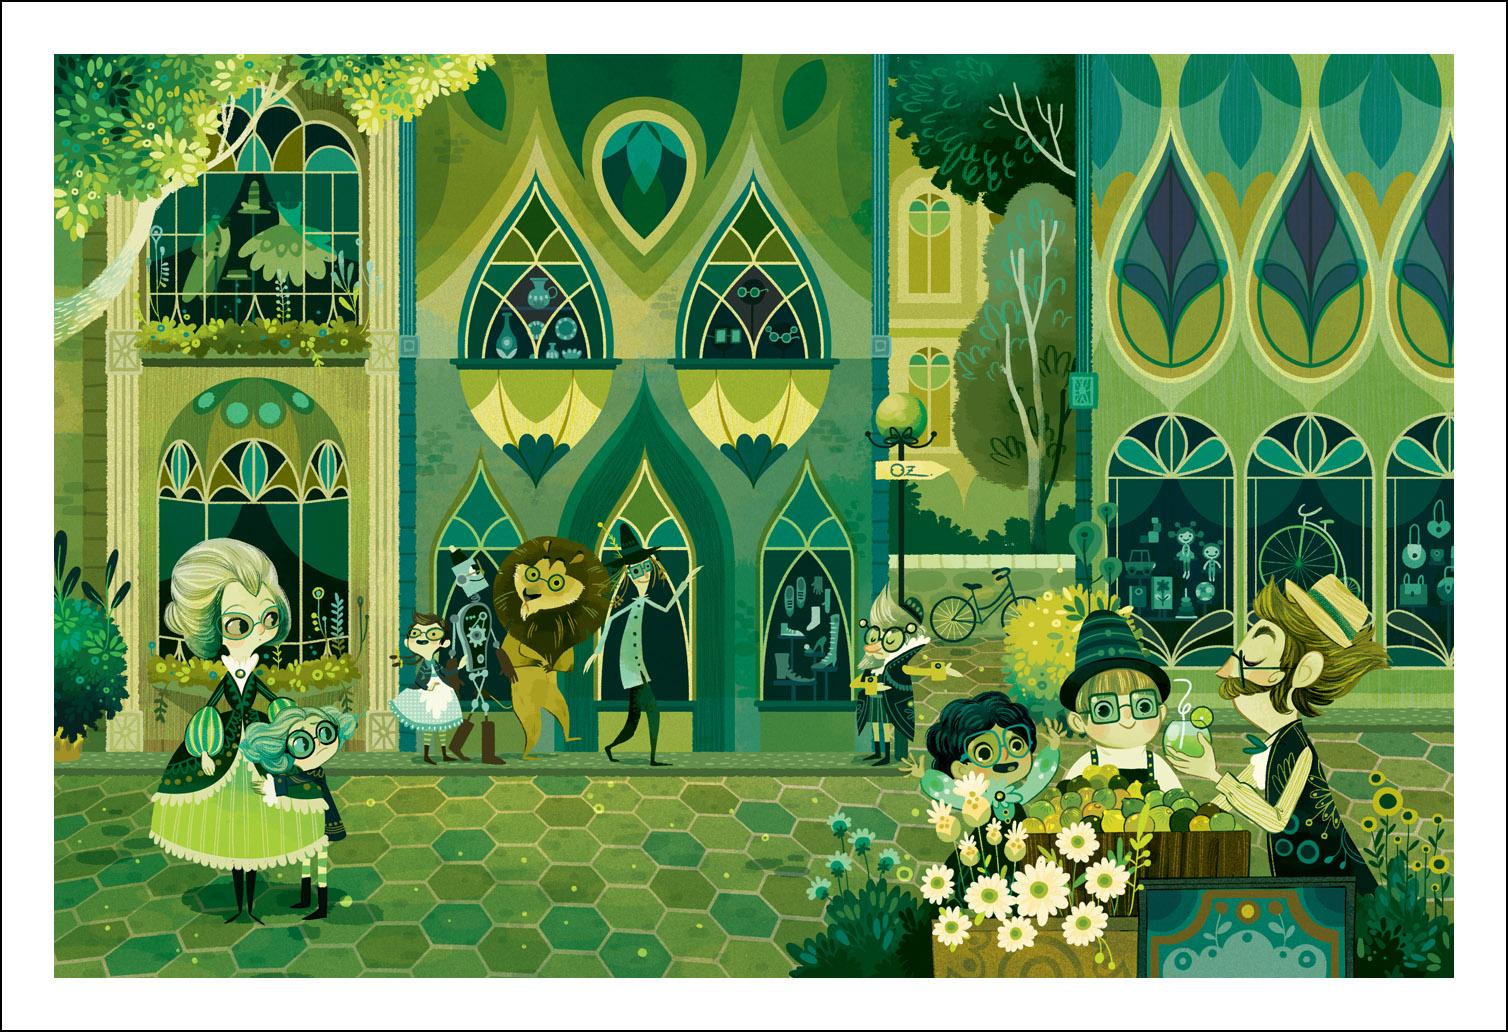 Lorena Alvarez, The Wonderful Wizard Of Oz